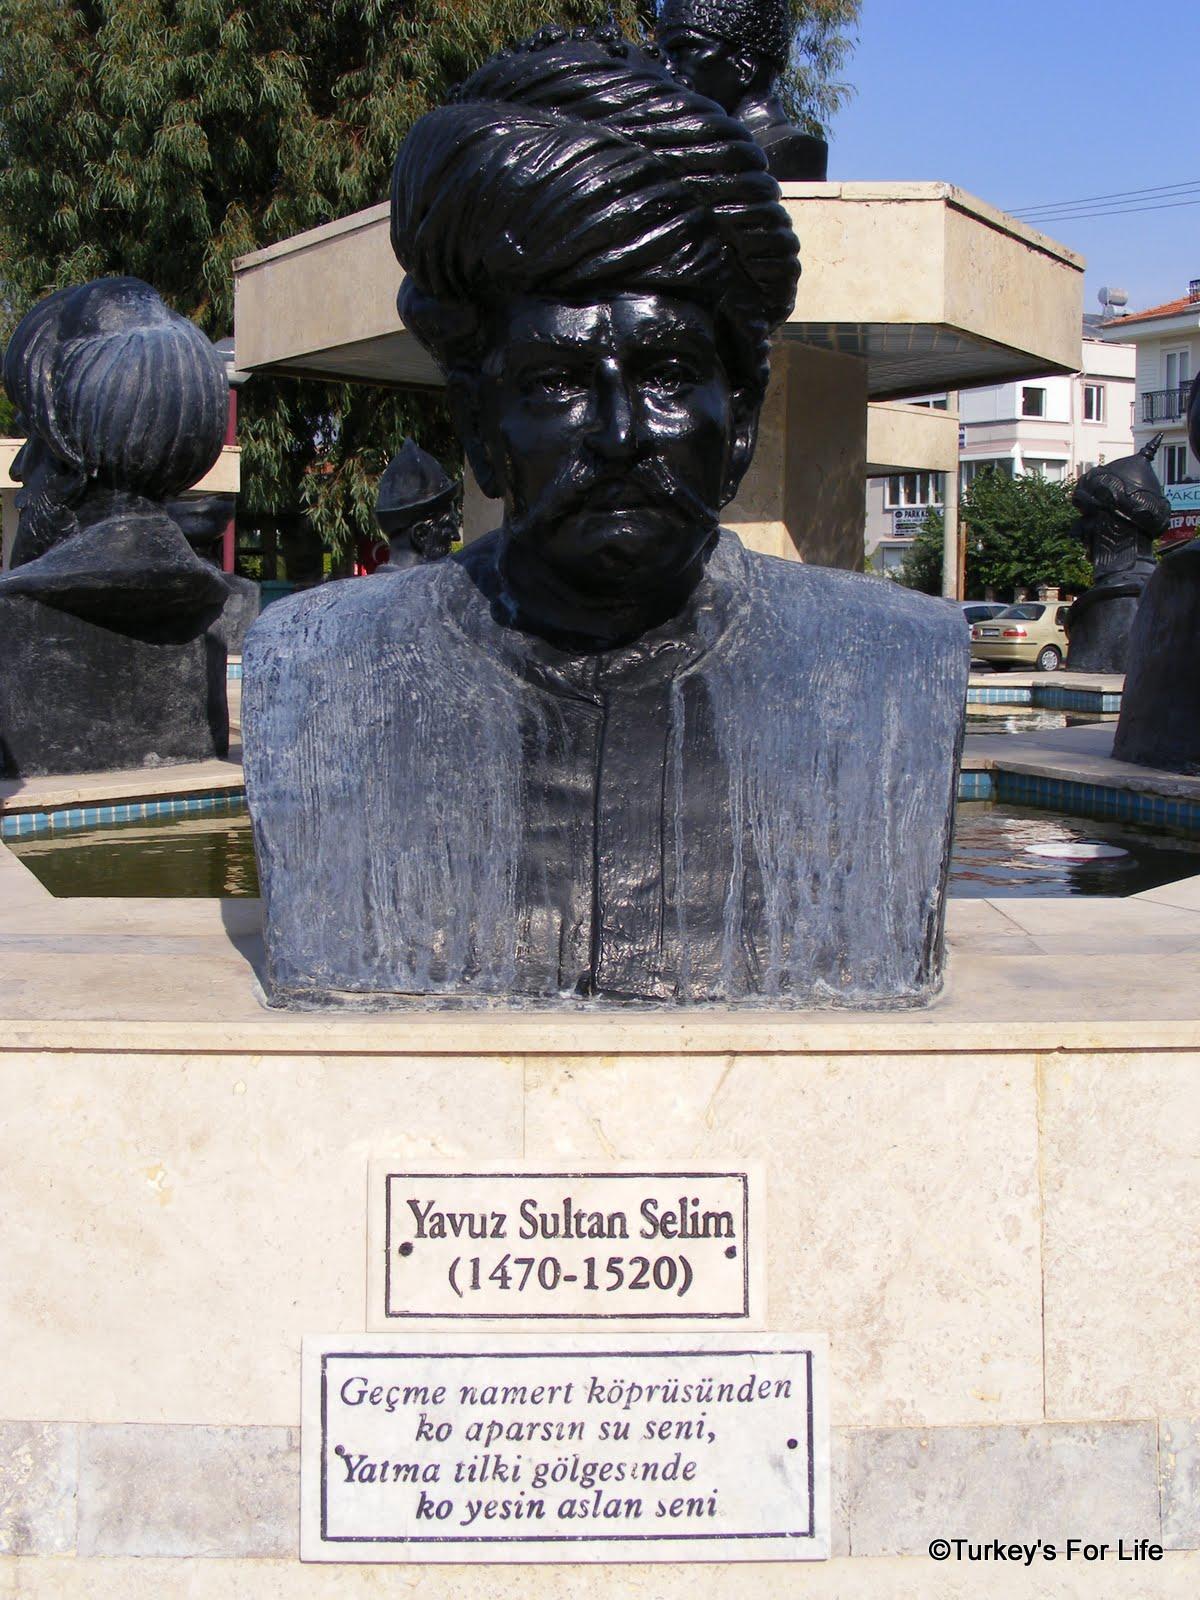 http://1.bp.blogspot.com/-W1WrIAF8RJo/TzzWKacHB7I/AAAAAAAAD44/6jy_cNf2Q7M/s1600/Fethiye+heads+Ottoman+Yavuz+Sultan+Selim.JPG